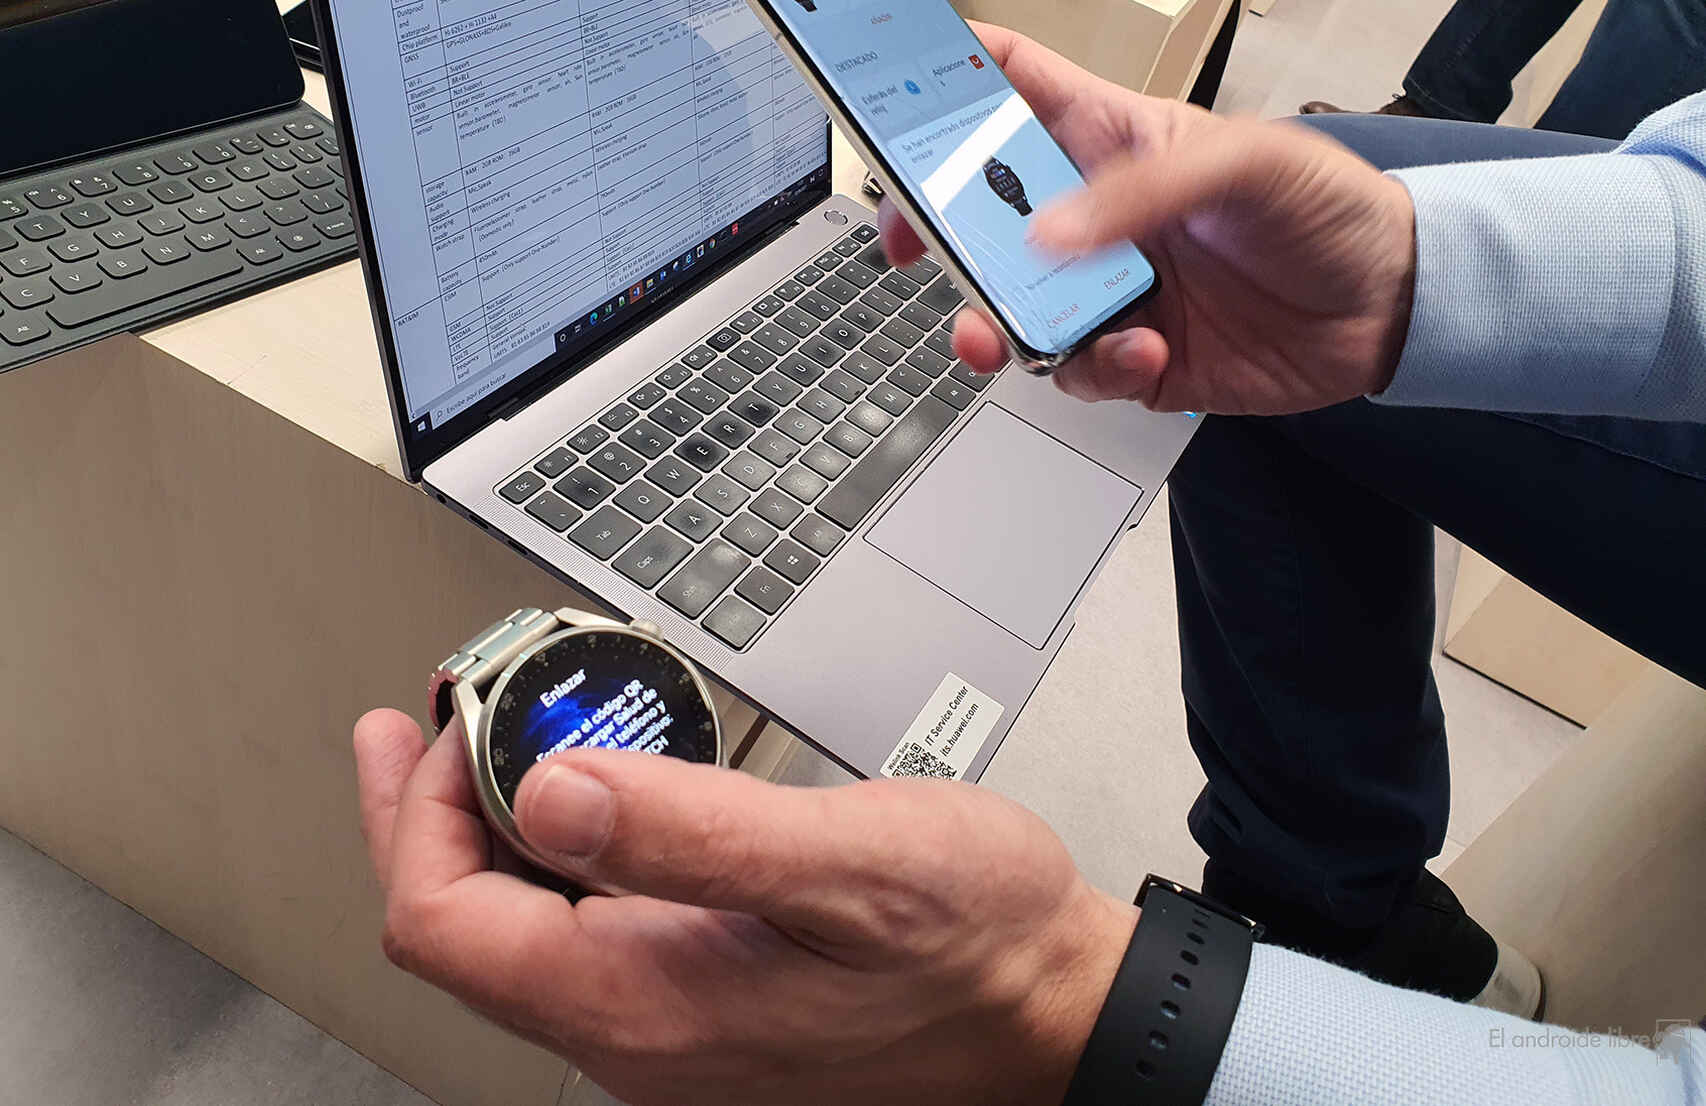 Vinculando el Huawei Watch 3